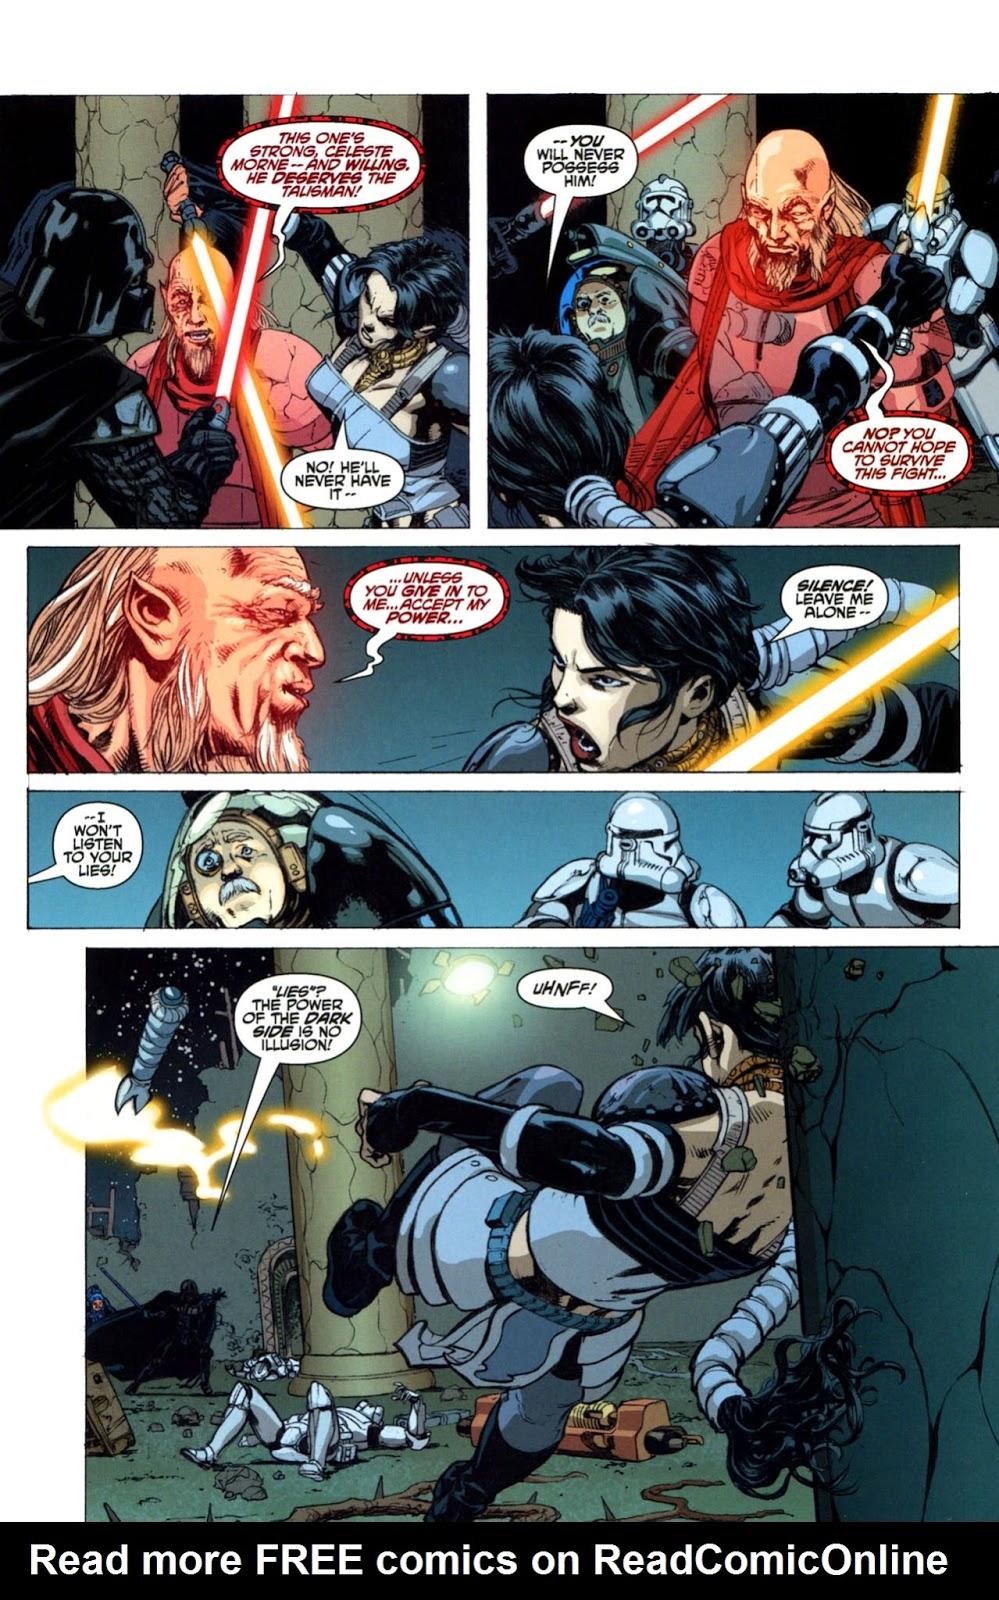 Darth Vader vs A'Sharad Hett - Page 3 Lu9bdifVnUngkUoDoPZH0IZbK4BBZ5tVnNMCLPsS5d2Awl7TYo3T2ZmspEzs493DaKowpKQkV7qlrJAK_58r2tRxEet4ZpDF7yOZm4ma9D5cVI8Aot8--PrYJUDBBjCs_iND0aRO